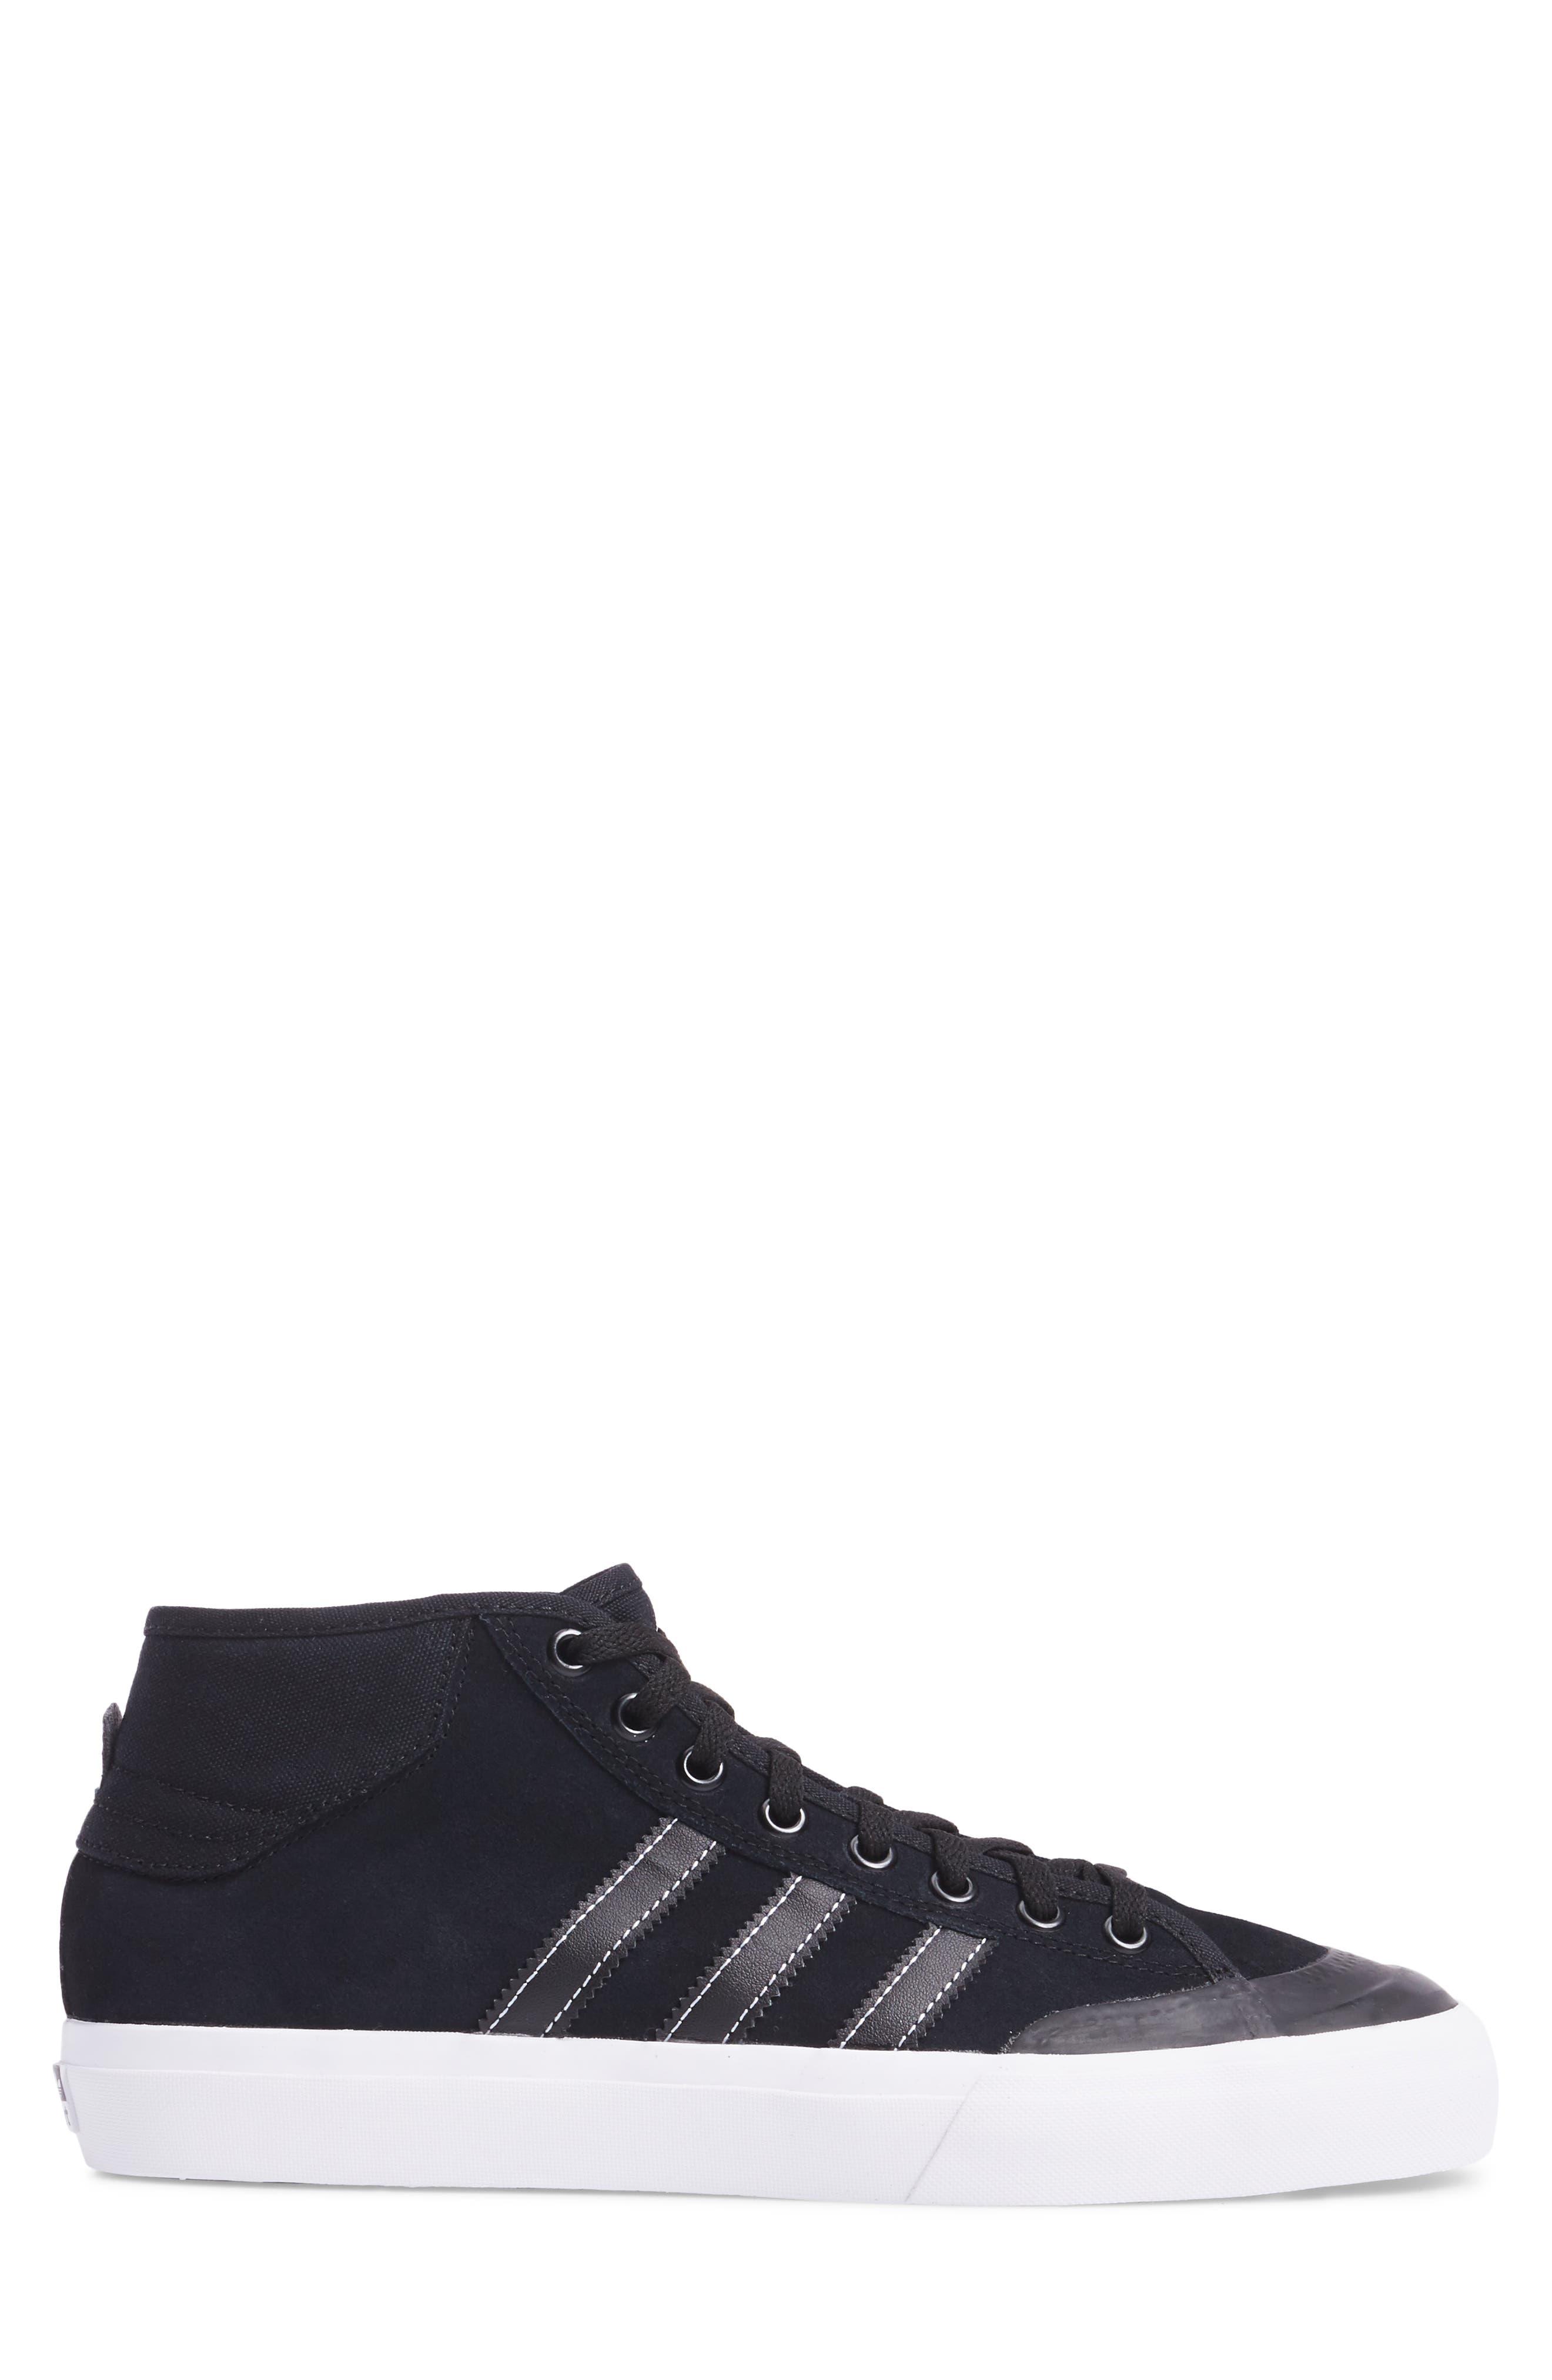 Matchcourt Mid ADV Sneaker,                             Alternate thumbnail 3, color,                             001